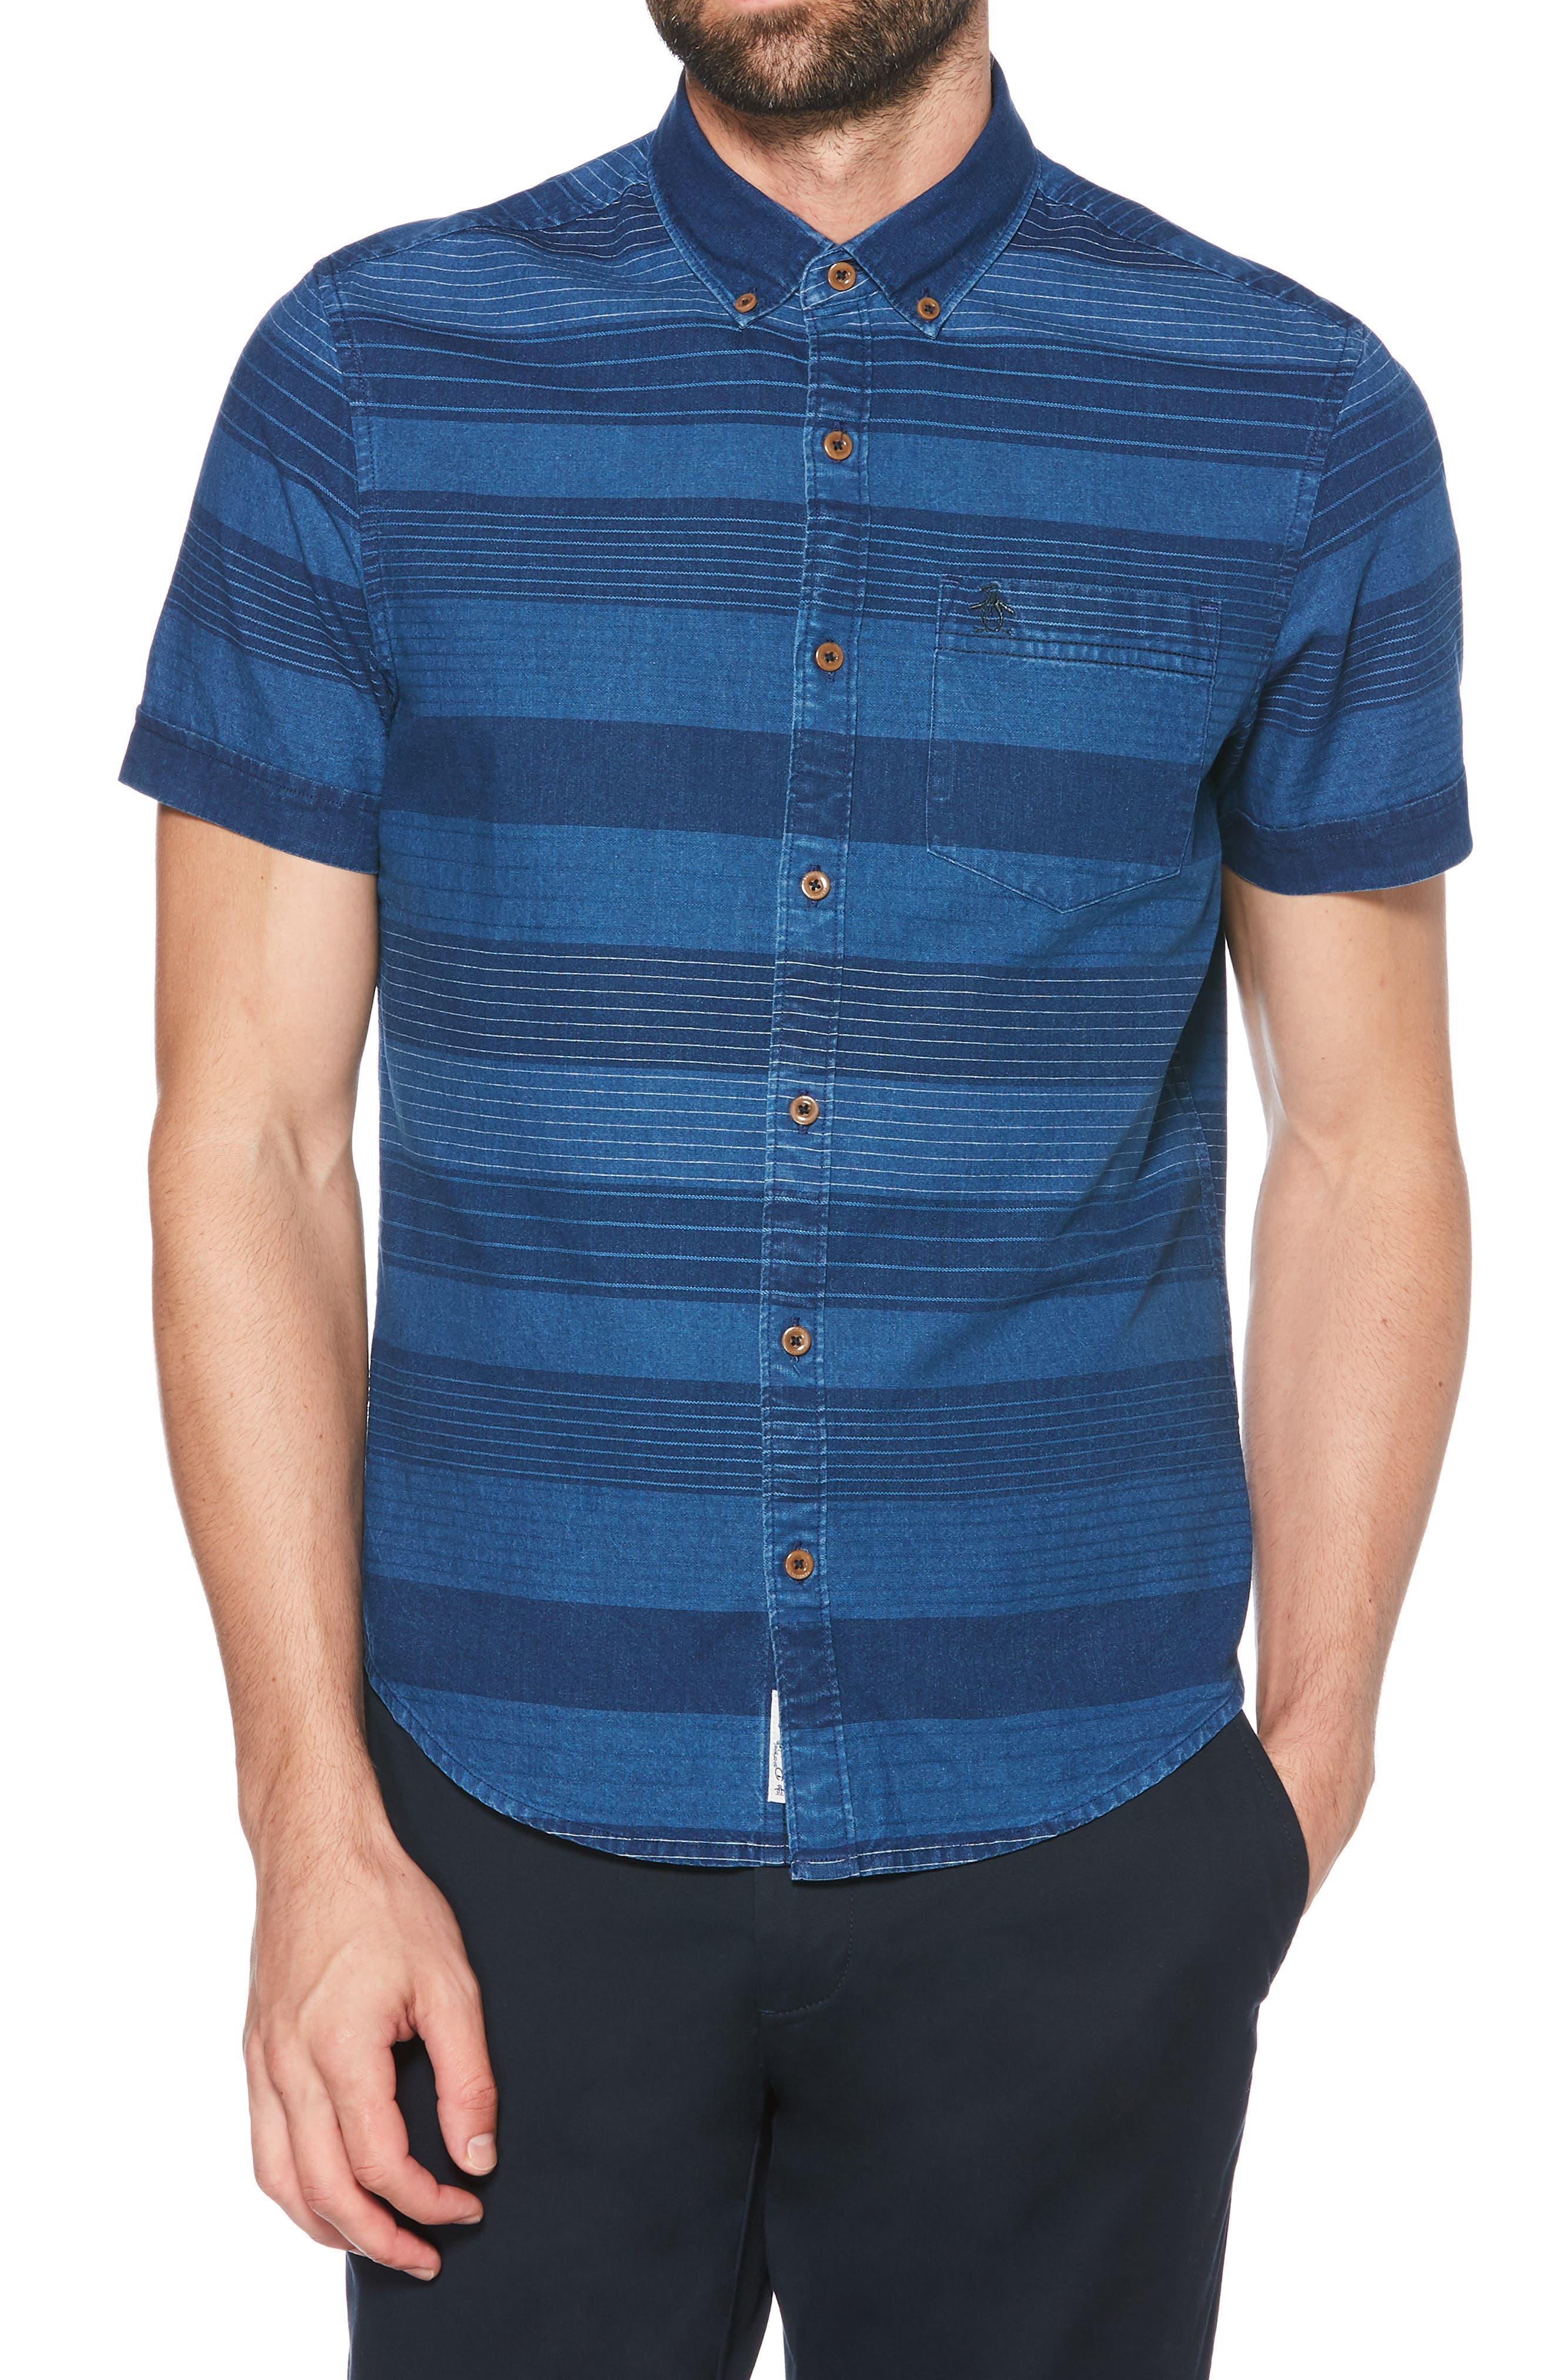 ORIGINAL PENGUIN, Slim Fit Dobby Striped Sport Shirt, Main thumbnail 1, color, DARK DENIM